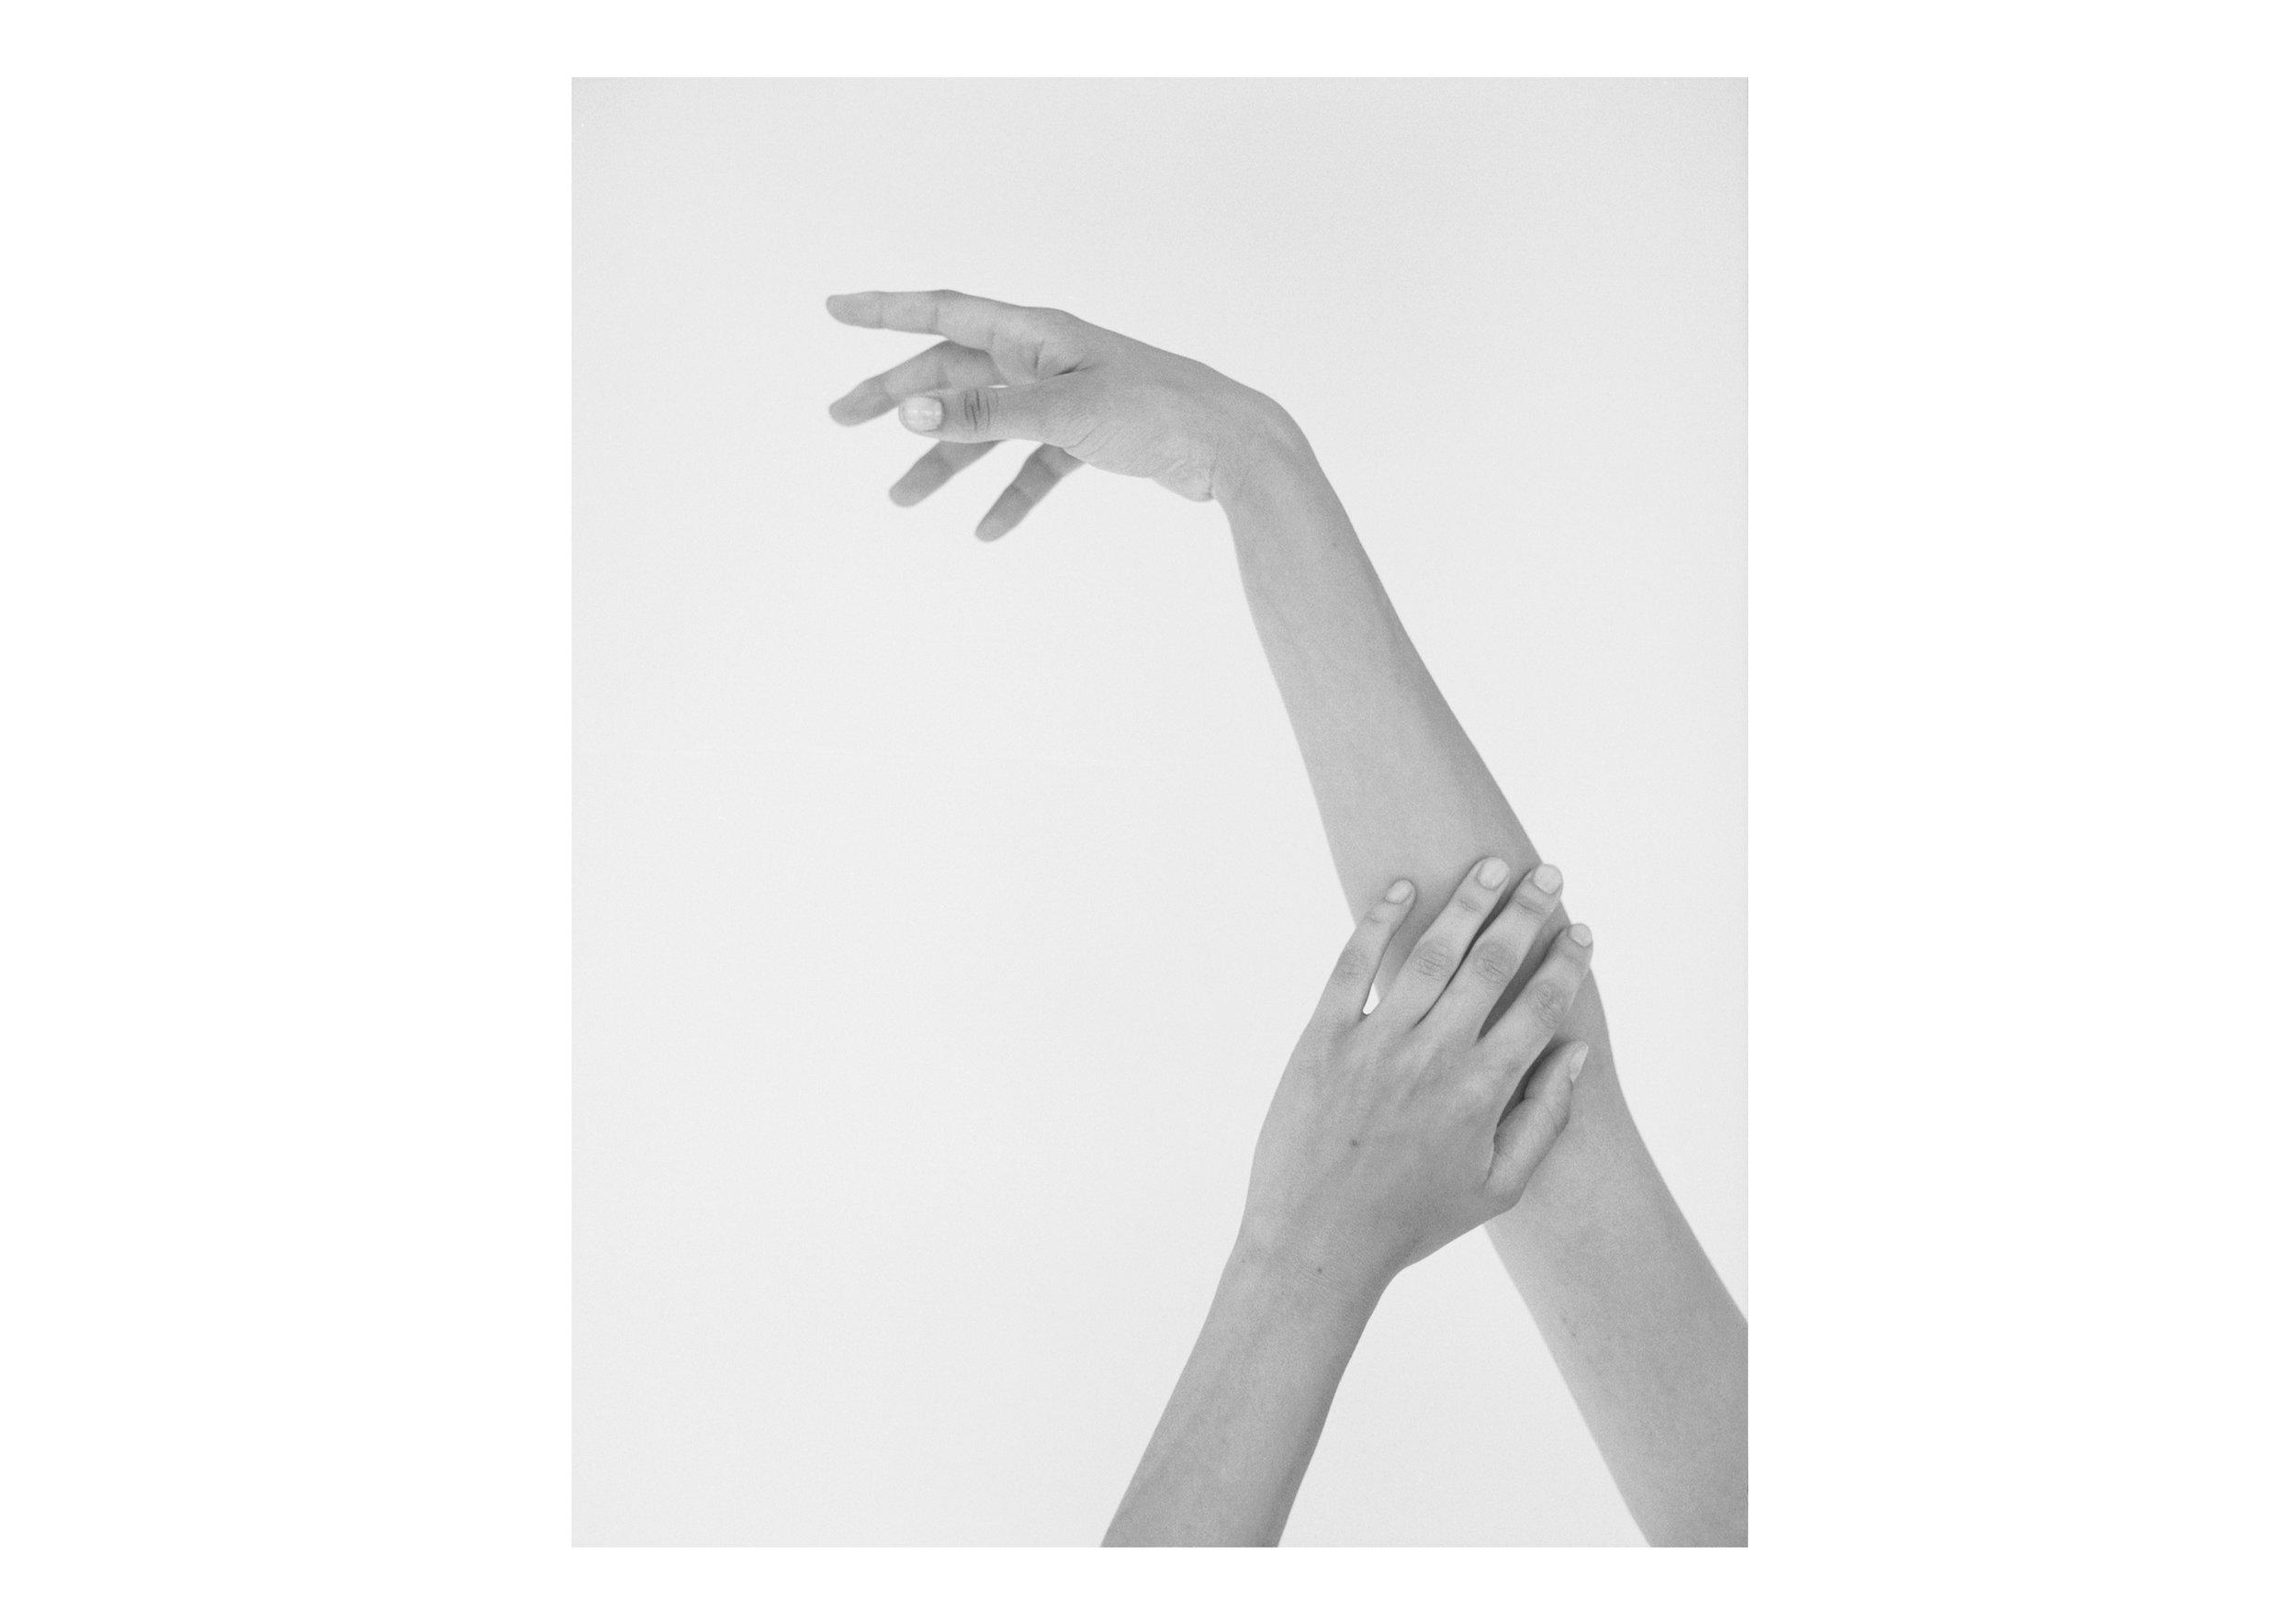 Untitled-10.jpg